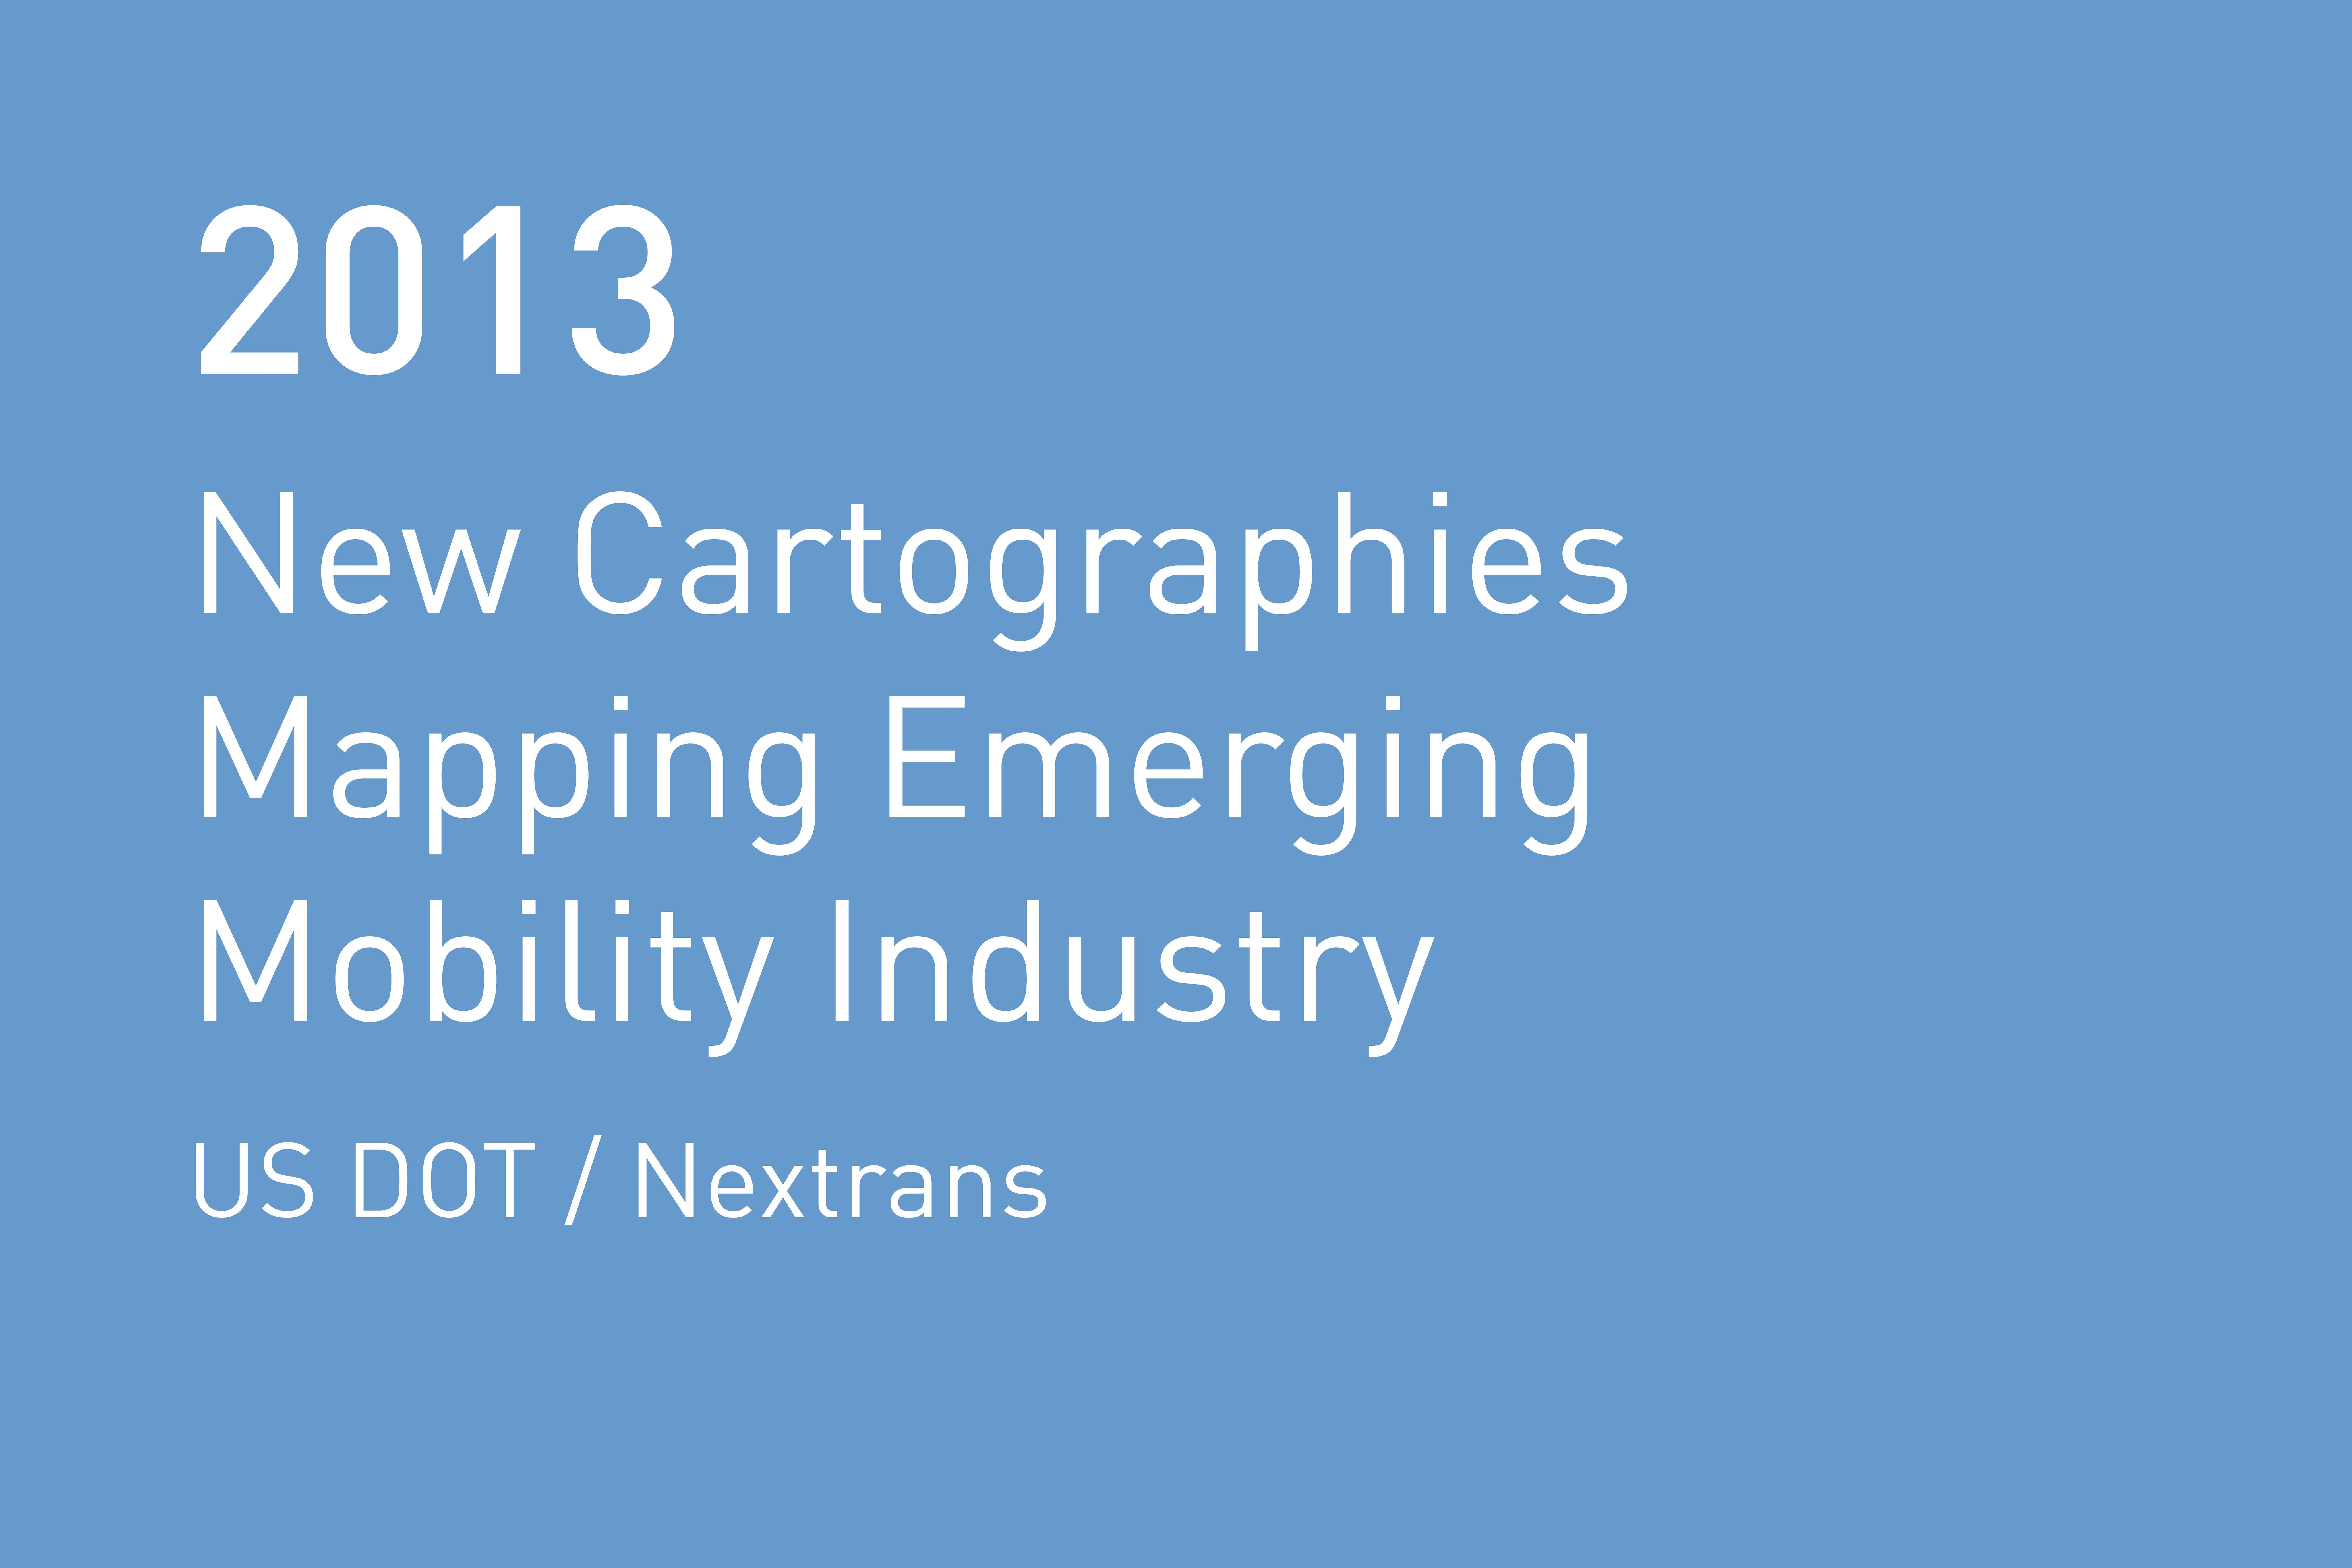 Rvtr 2013 usdot nextrans cartographies